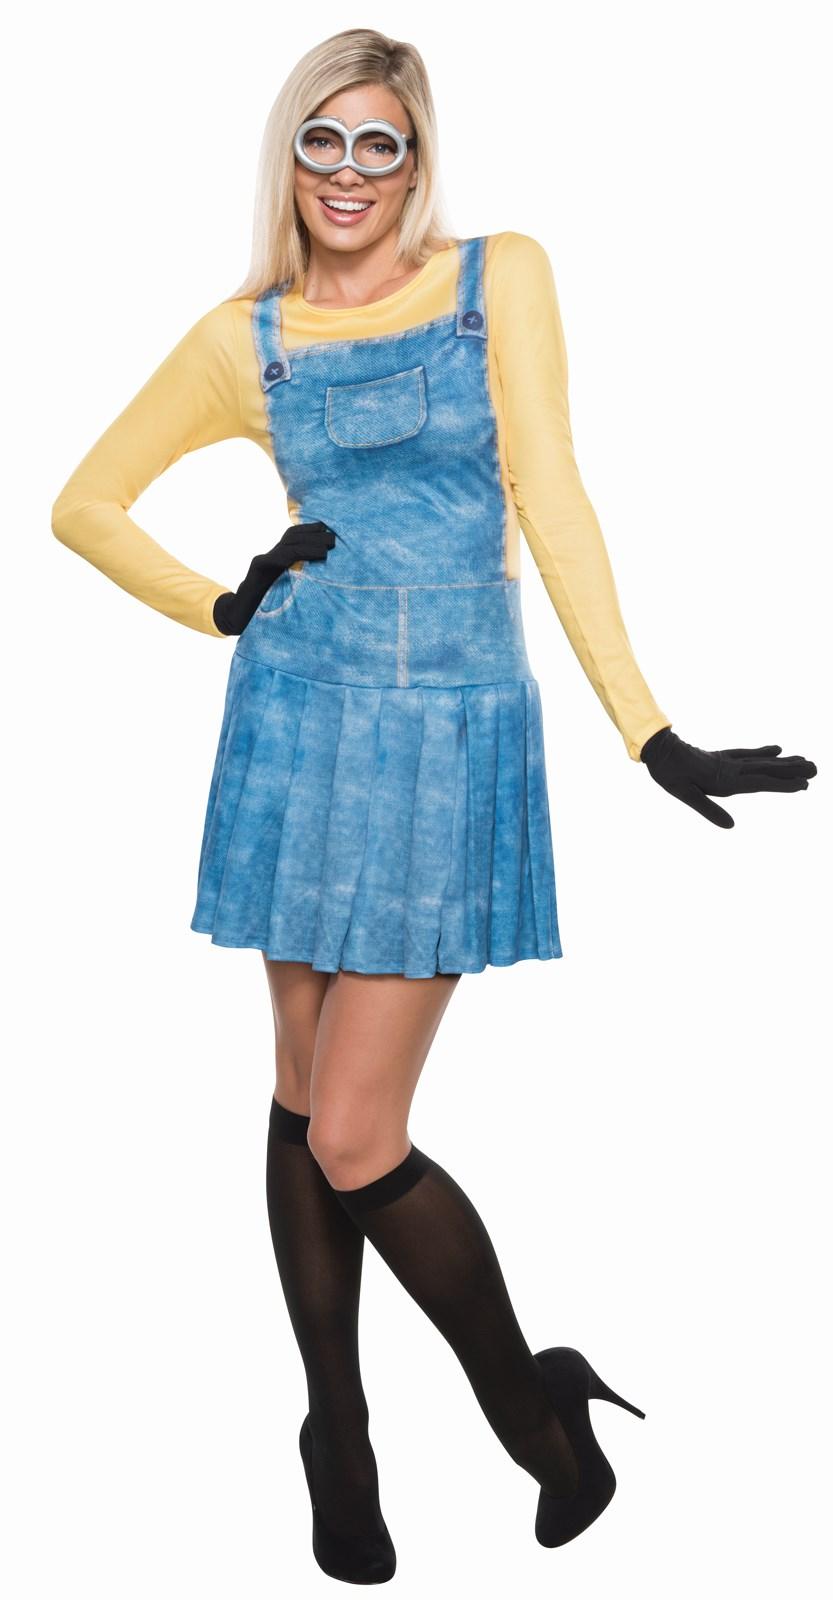 Minions Movie: Womens Minion Adult Costume